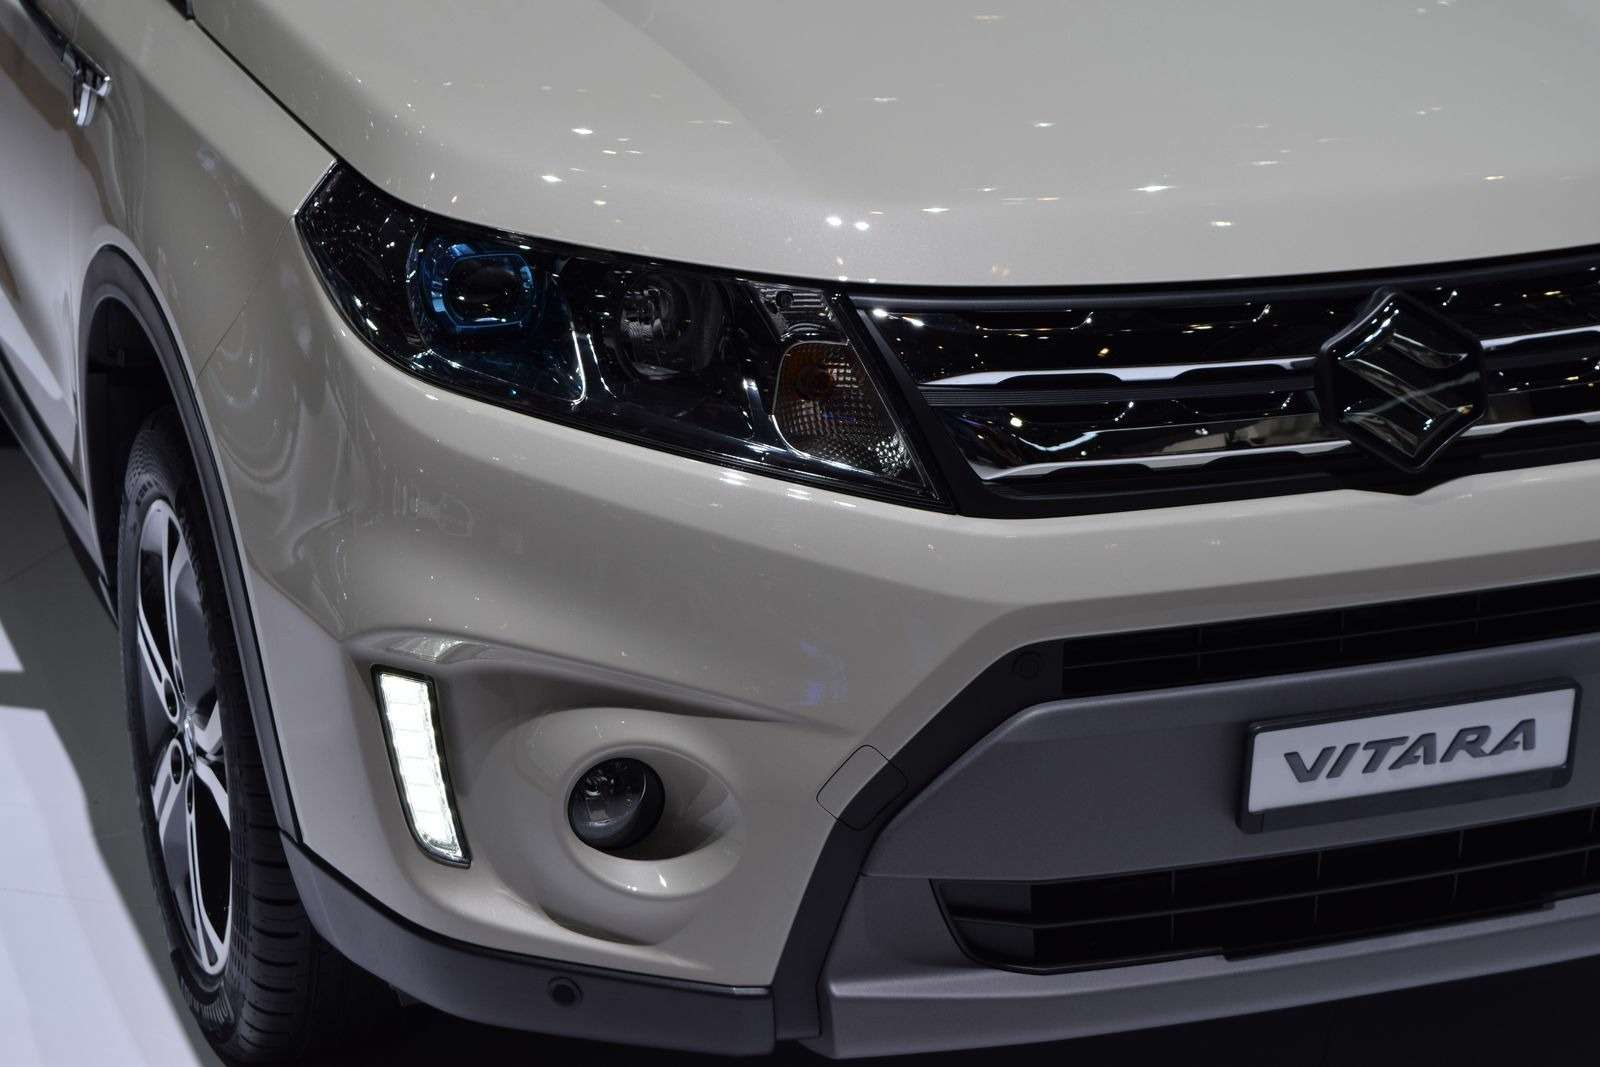 Suzuki предложит новую Vitara вРФпоцене менее 1млн руб.— фото 368908